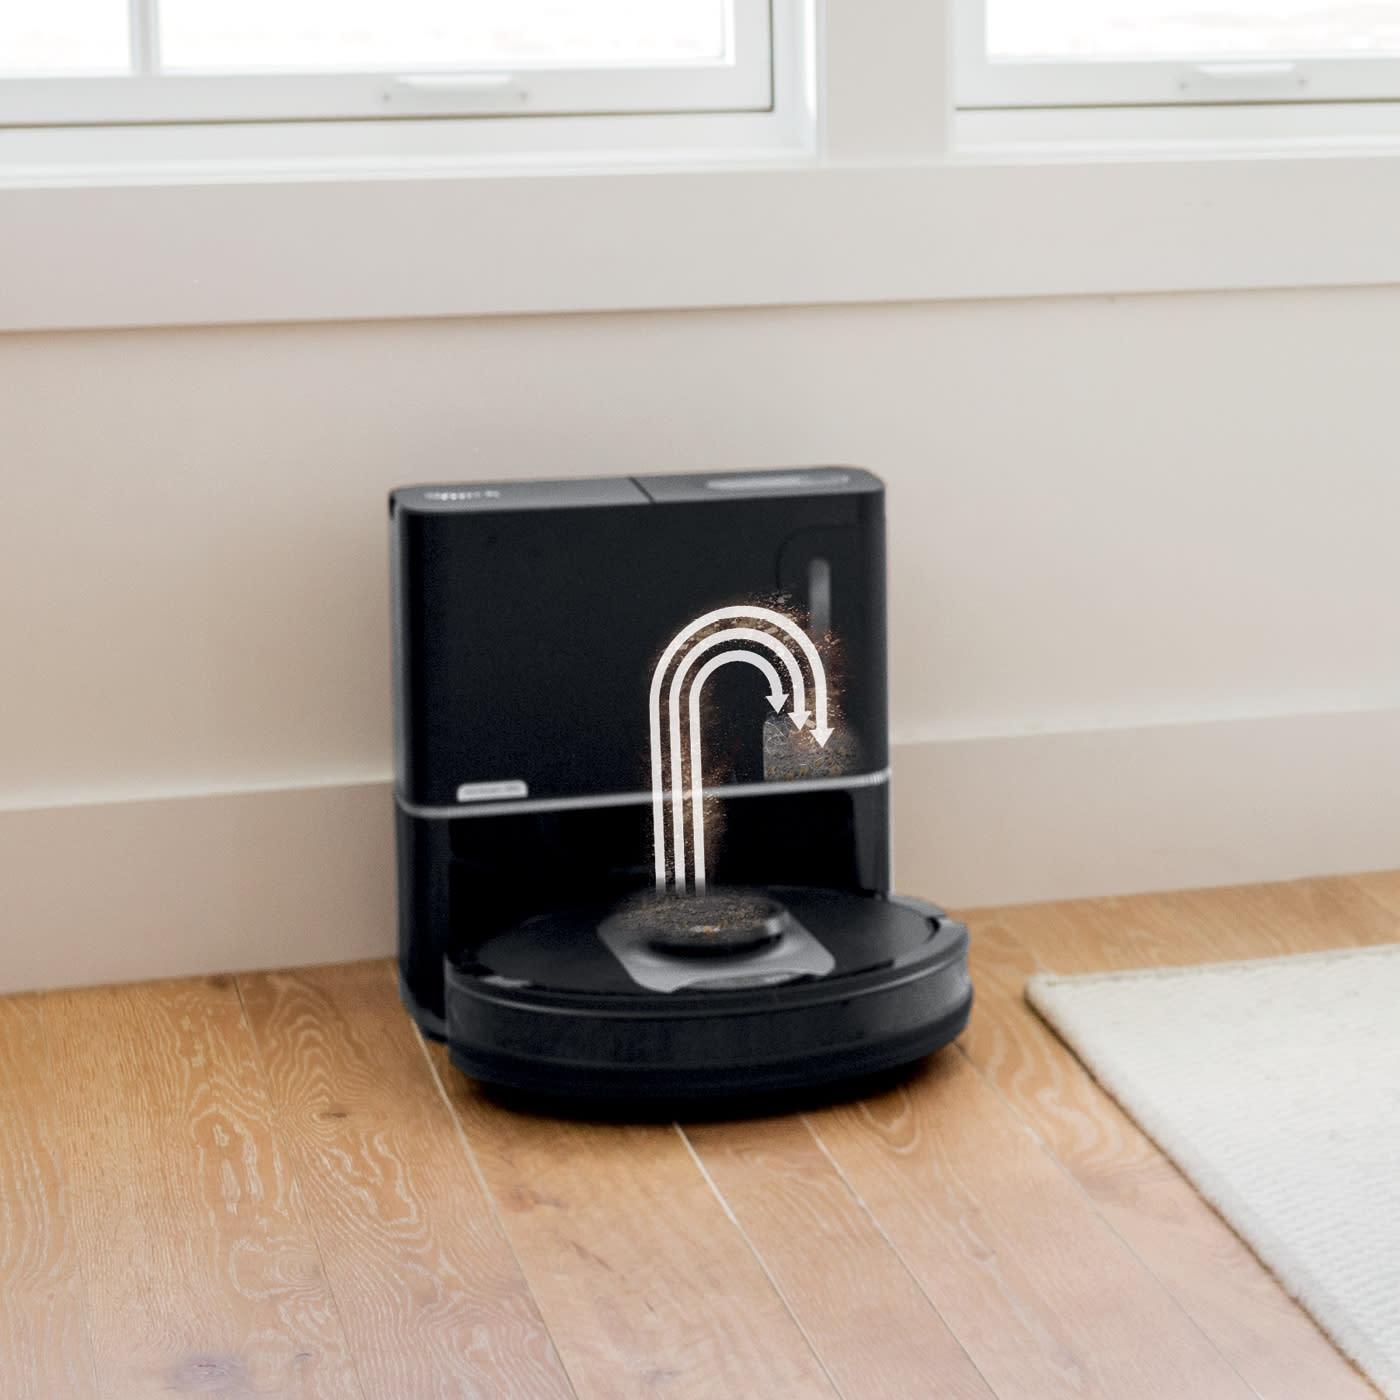 Self-Empty Vacuuming